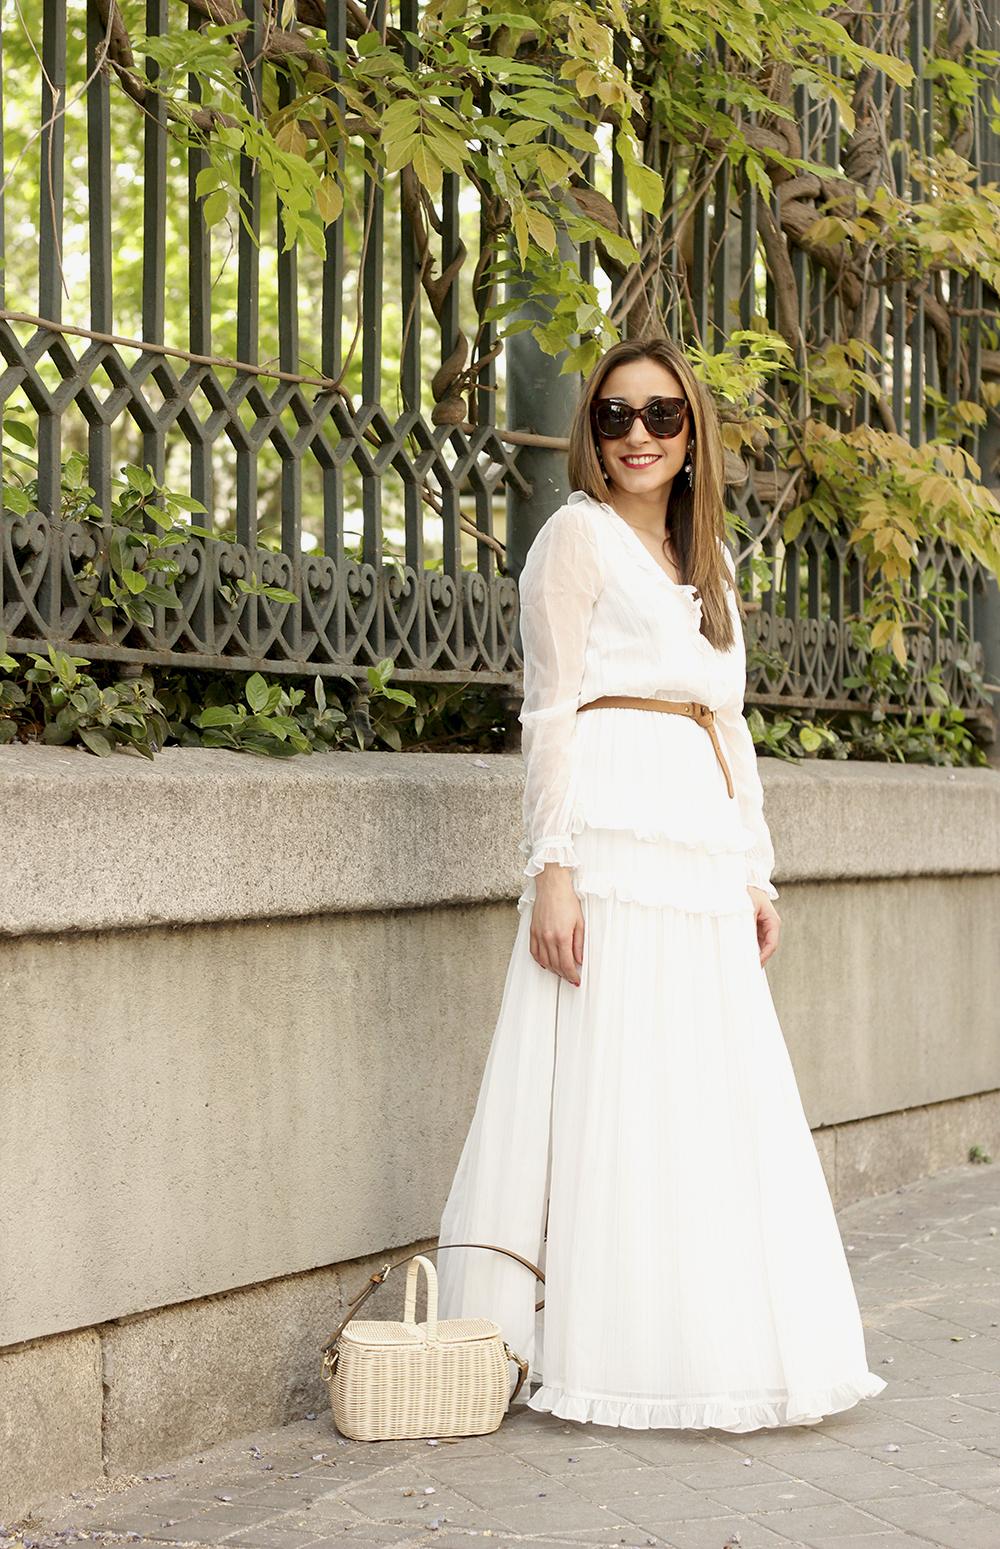 white maxi dress Subtle golden stripes wicker bag sandals céline sunnies spring outfit 05